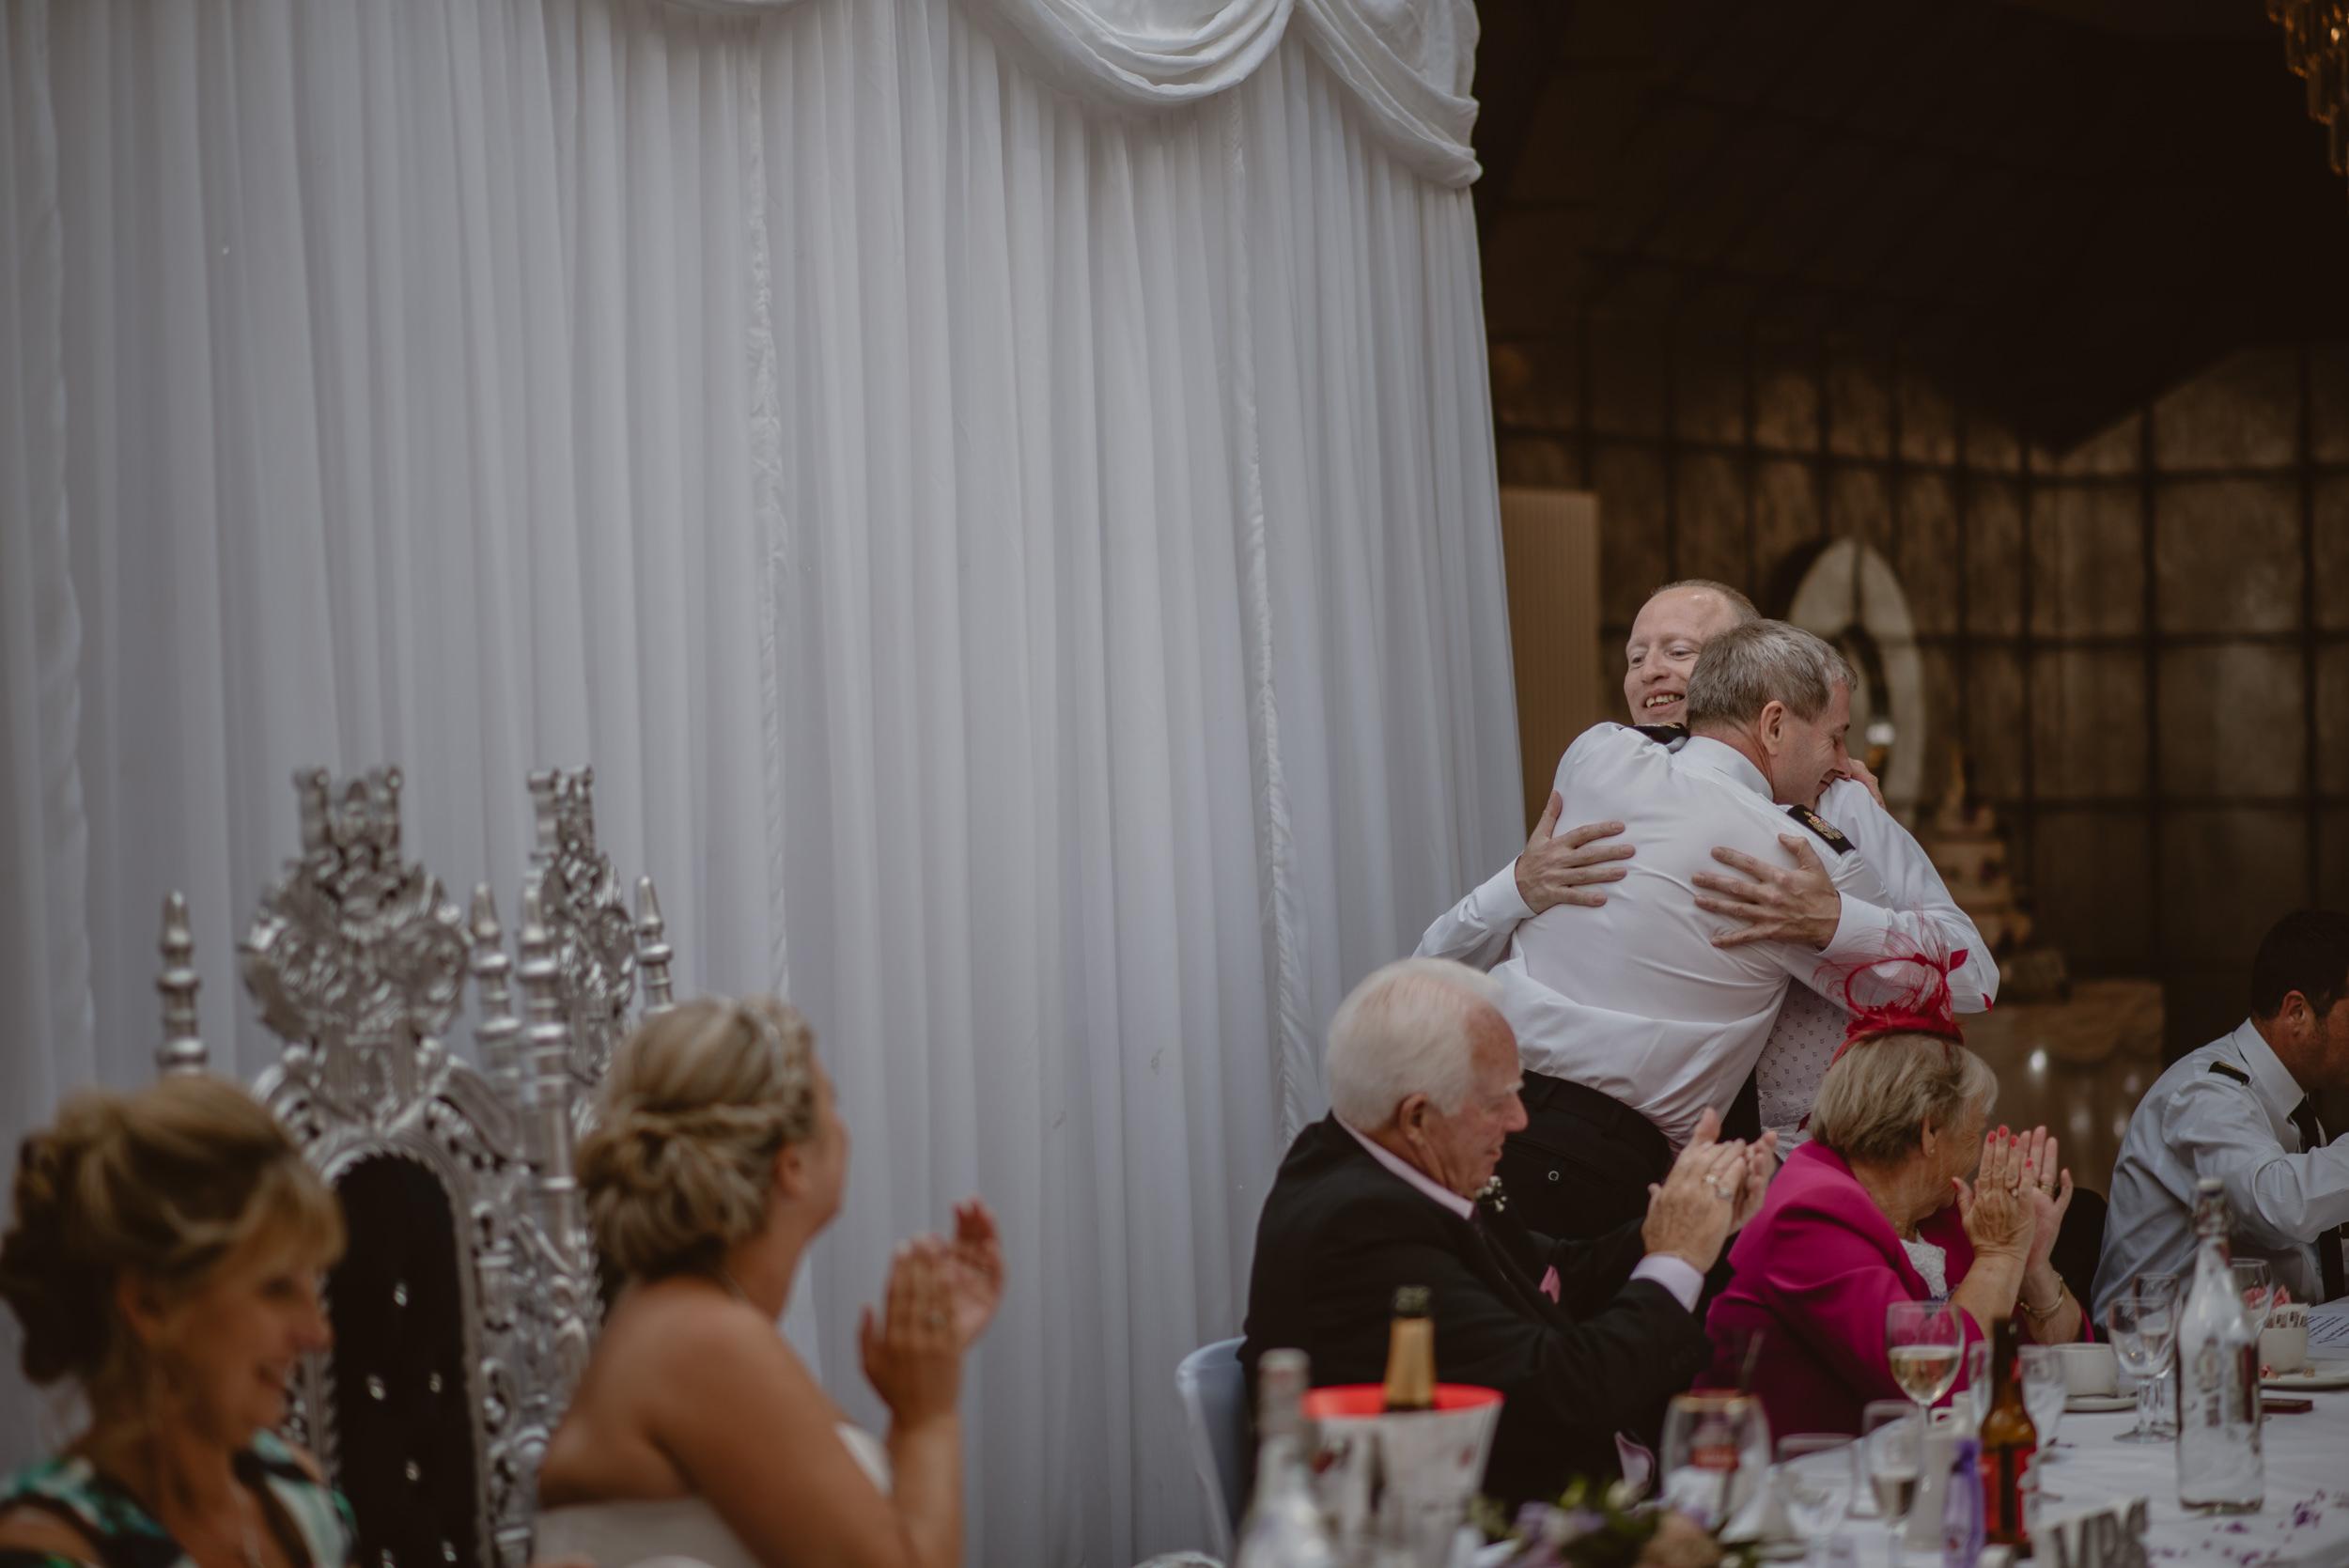 Chantelle-and-Stephen-Old-Thorns-Hotel-Wedding-Liphook-Manu-Mendoza-Wedding-Photography-443.jpg